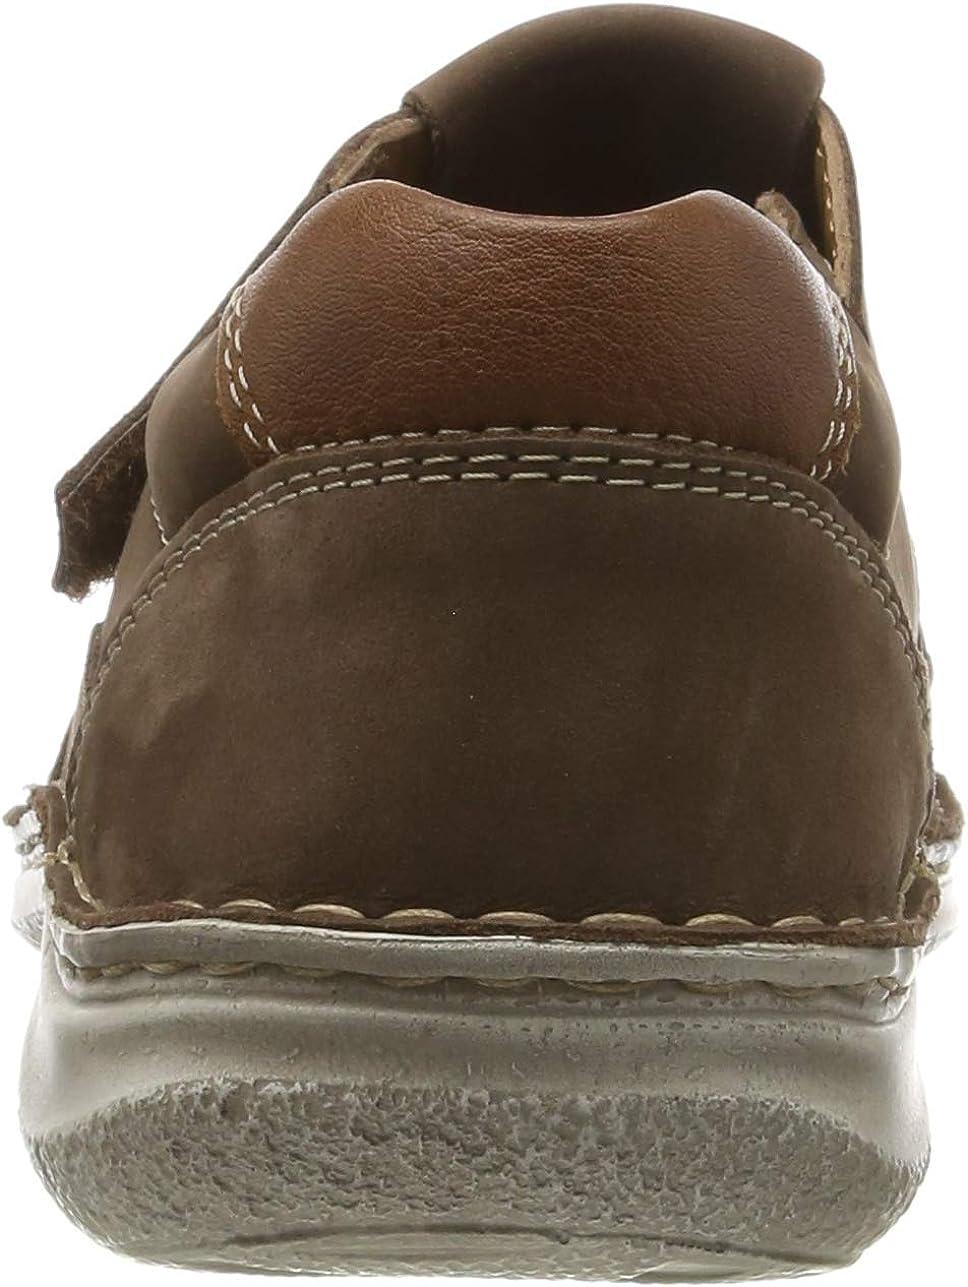 Josef Seibel Mens Anvers 81 Closed Toe Sandals